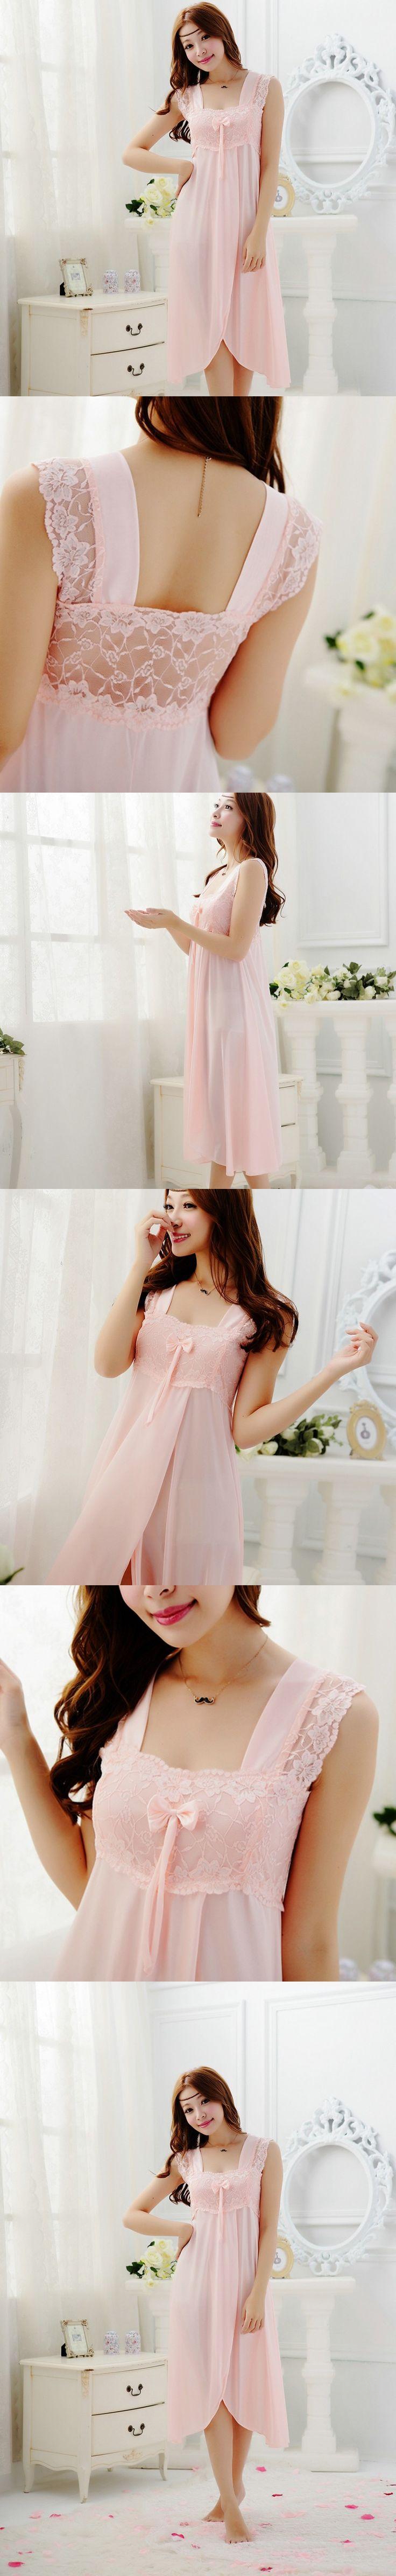 Free shipping long lace sexy nightdress for women girls bow long pajamas Elegant Sleepwear nightgown lovely night dress Y218